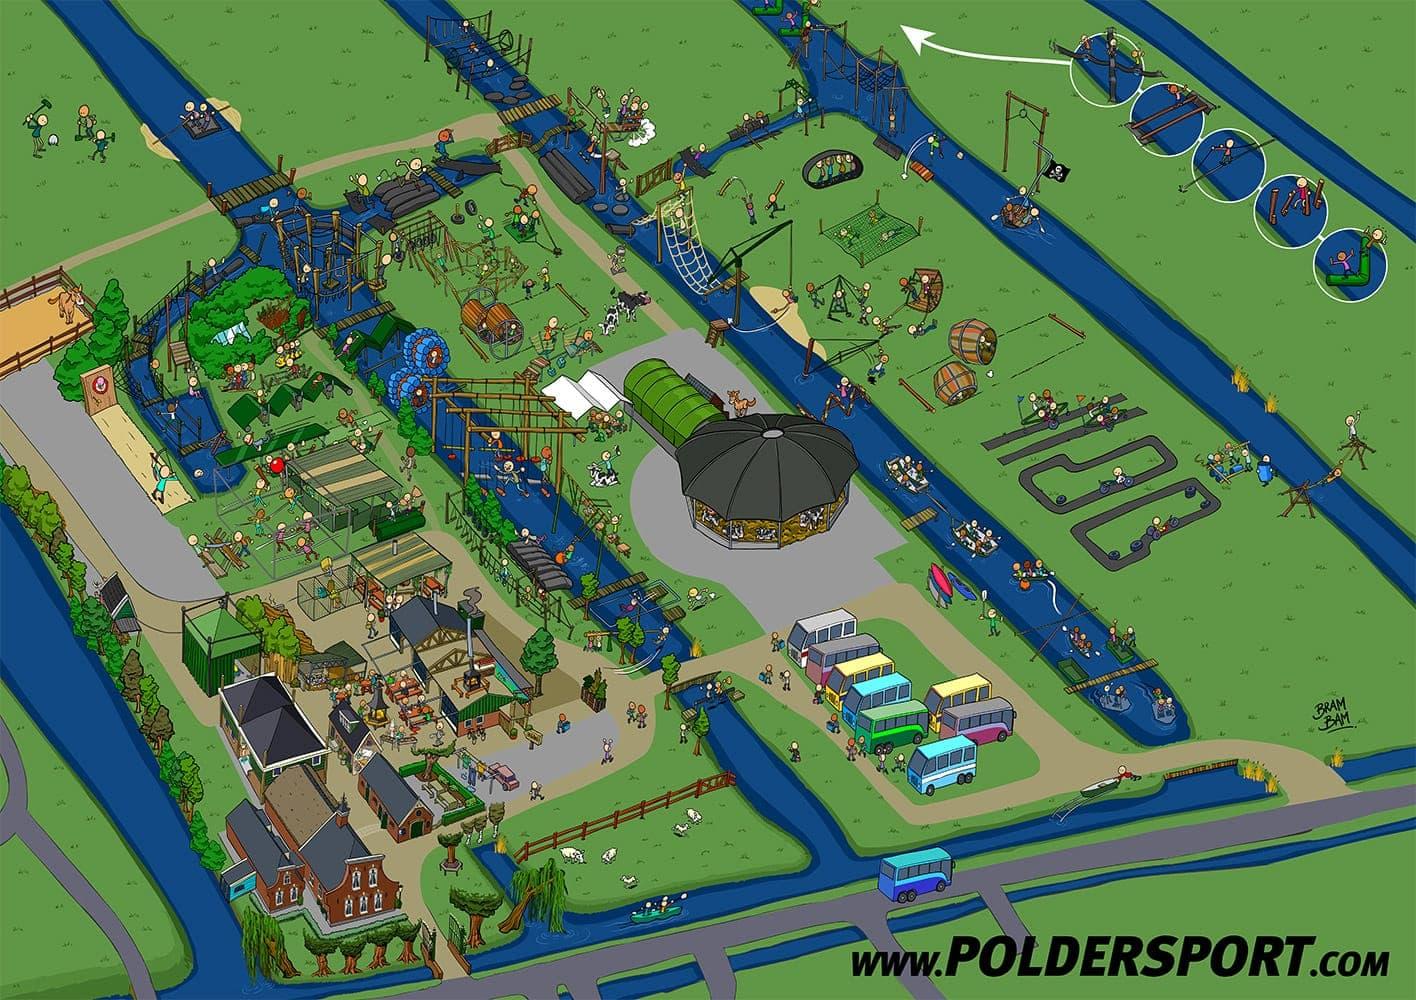 Poldersport plattegrond